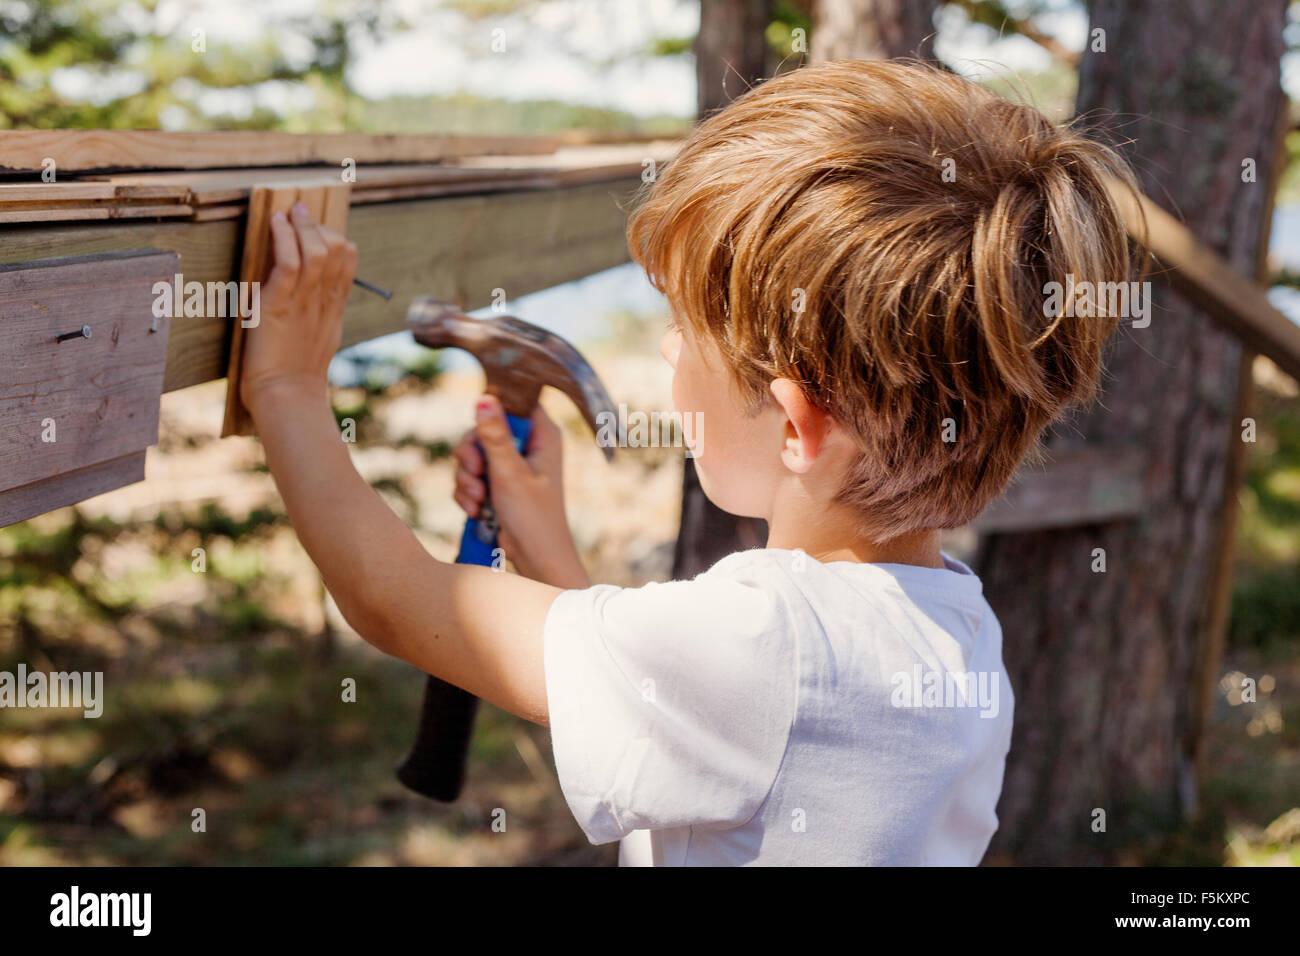 Sweden, Uppland, Runmaro, Barrskar, Boy (4-5) pounding hammer - Stock Image